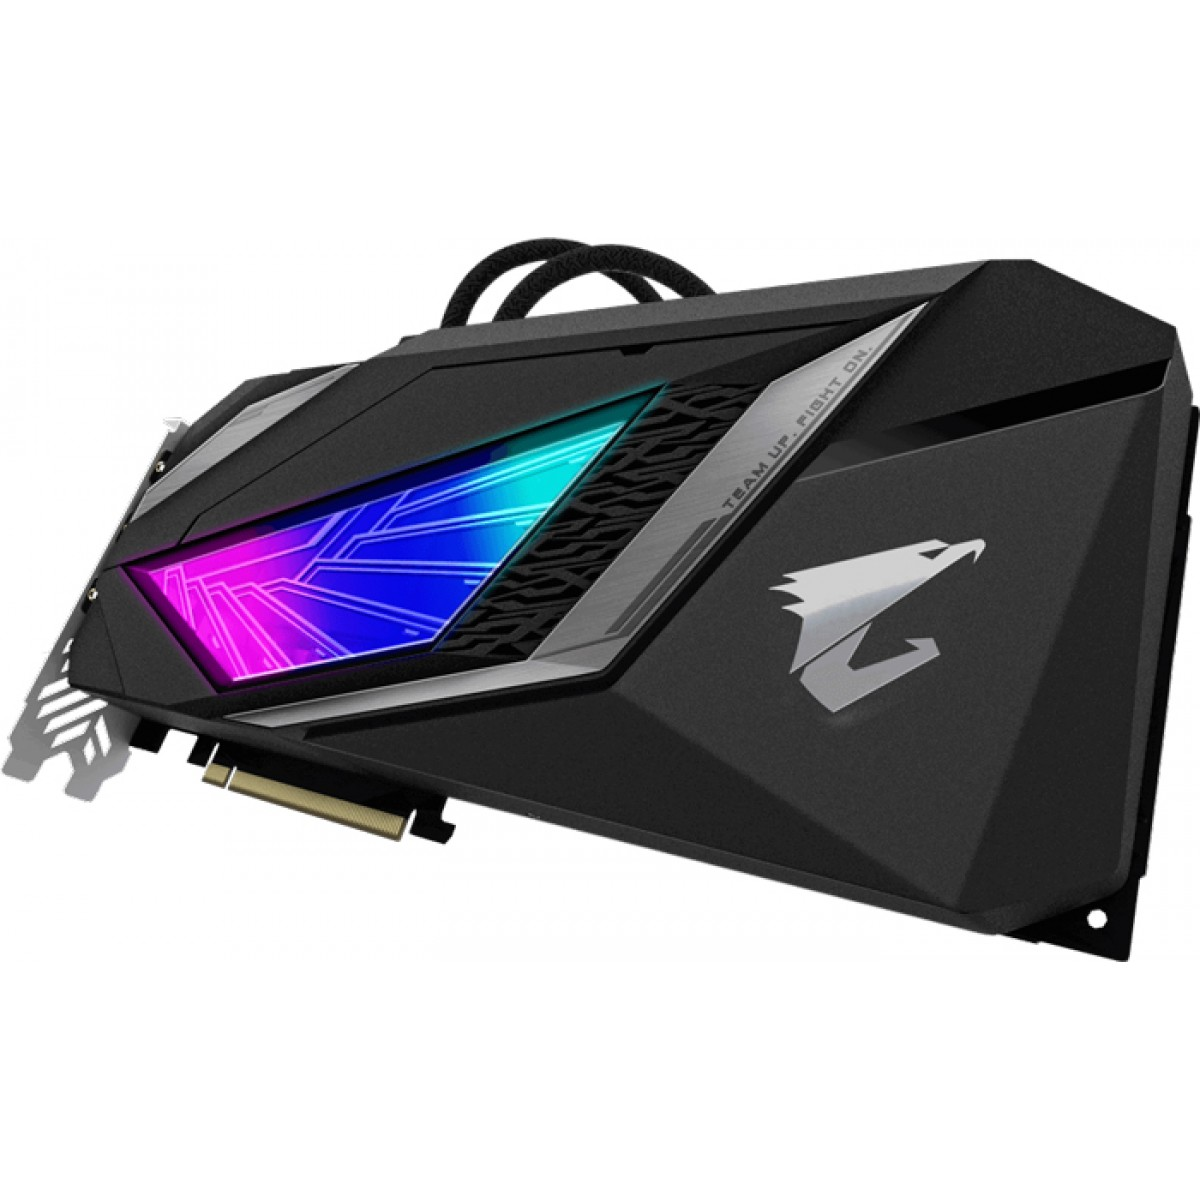 Placa de Vídeo Gigabyte Aorus GeForce RTX 2080 Super Waterforce, 8GB GDDR6, 256Bit, GV-N208SAORUS W-8GC